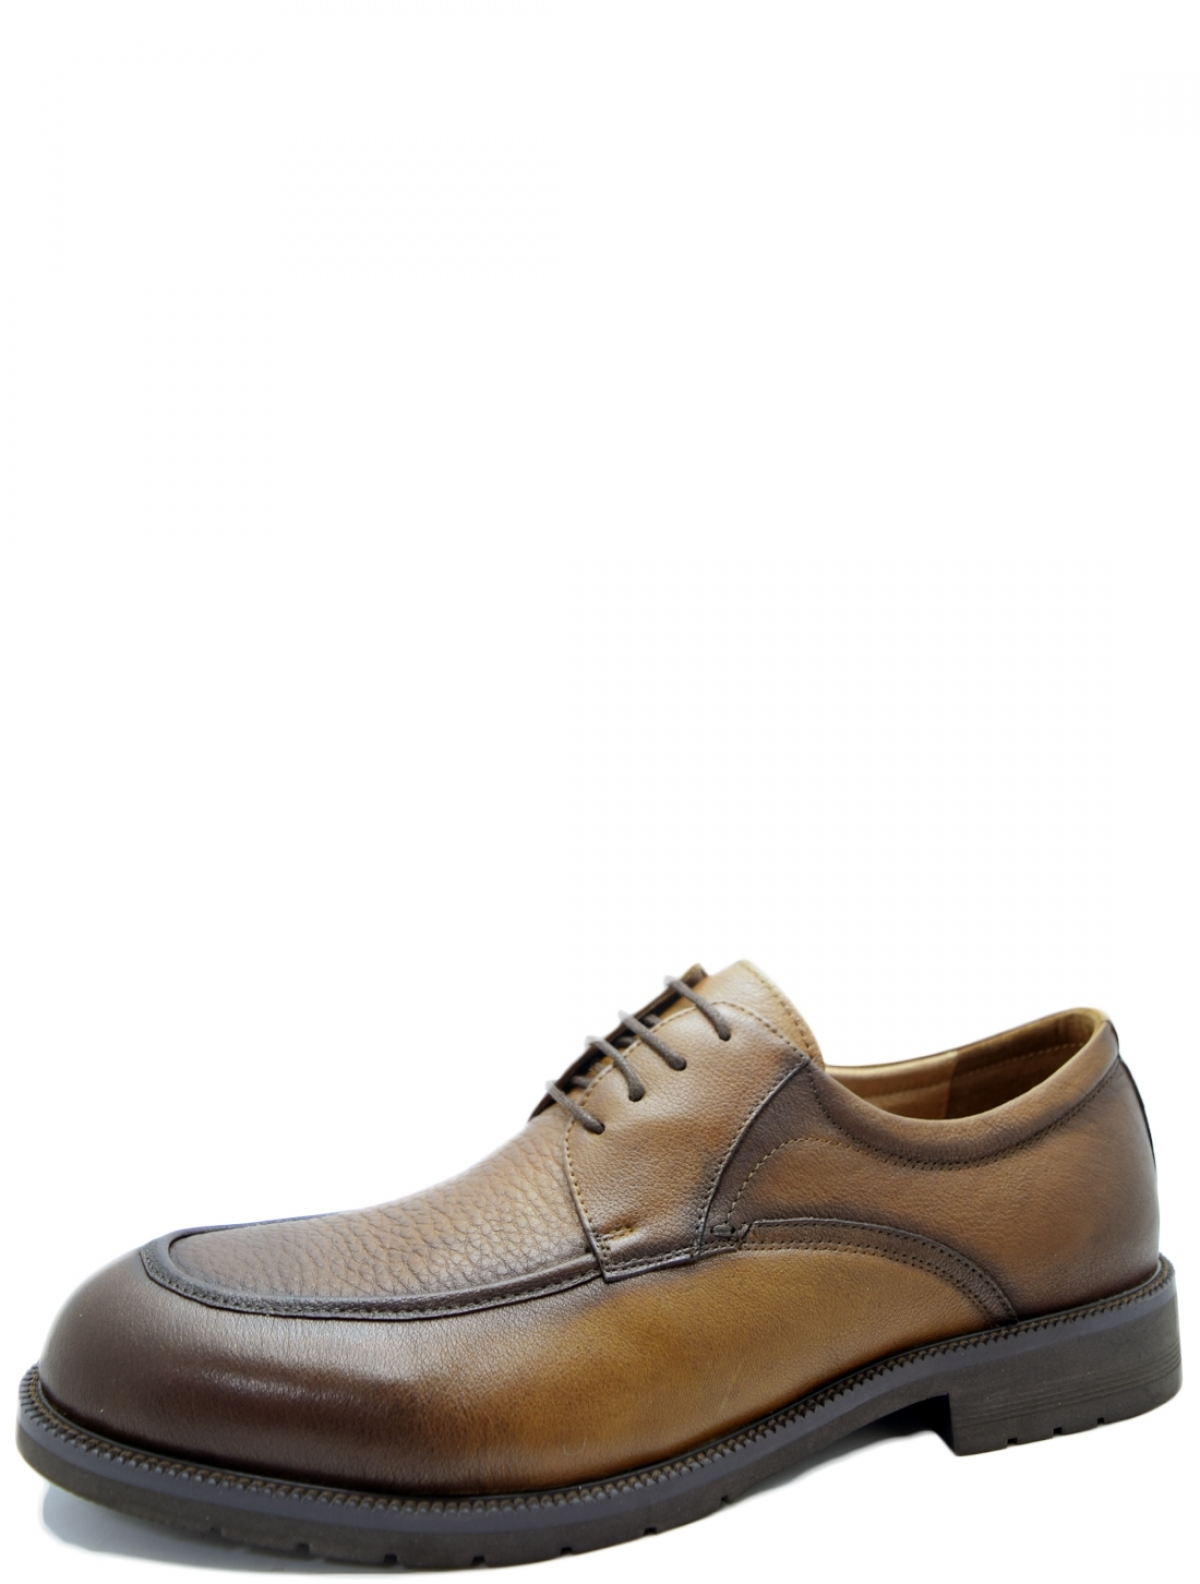 Roscote 807002-C19-T2866 мужские туфли